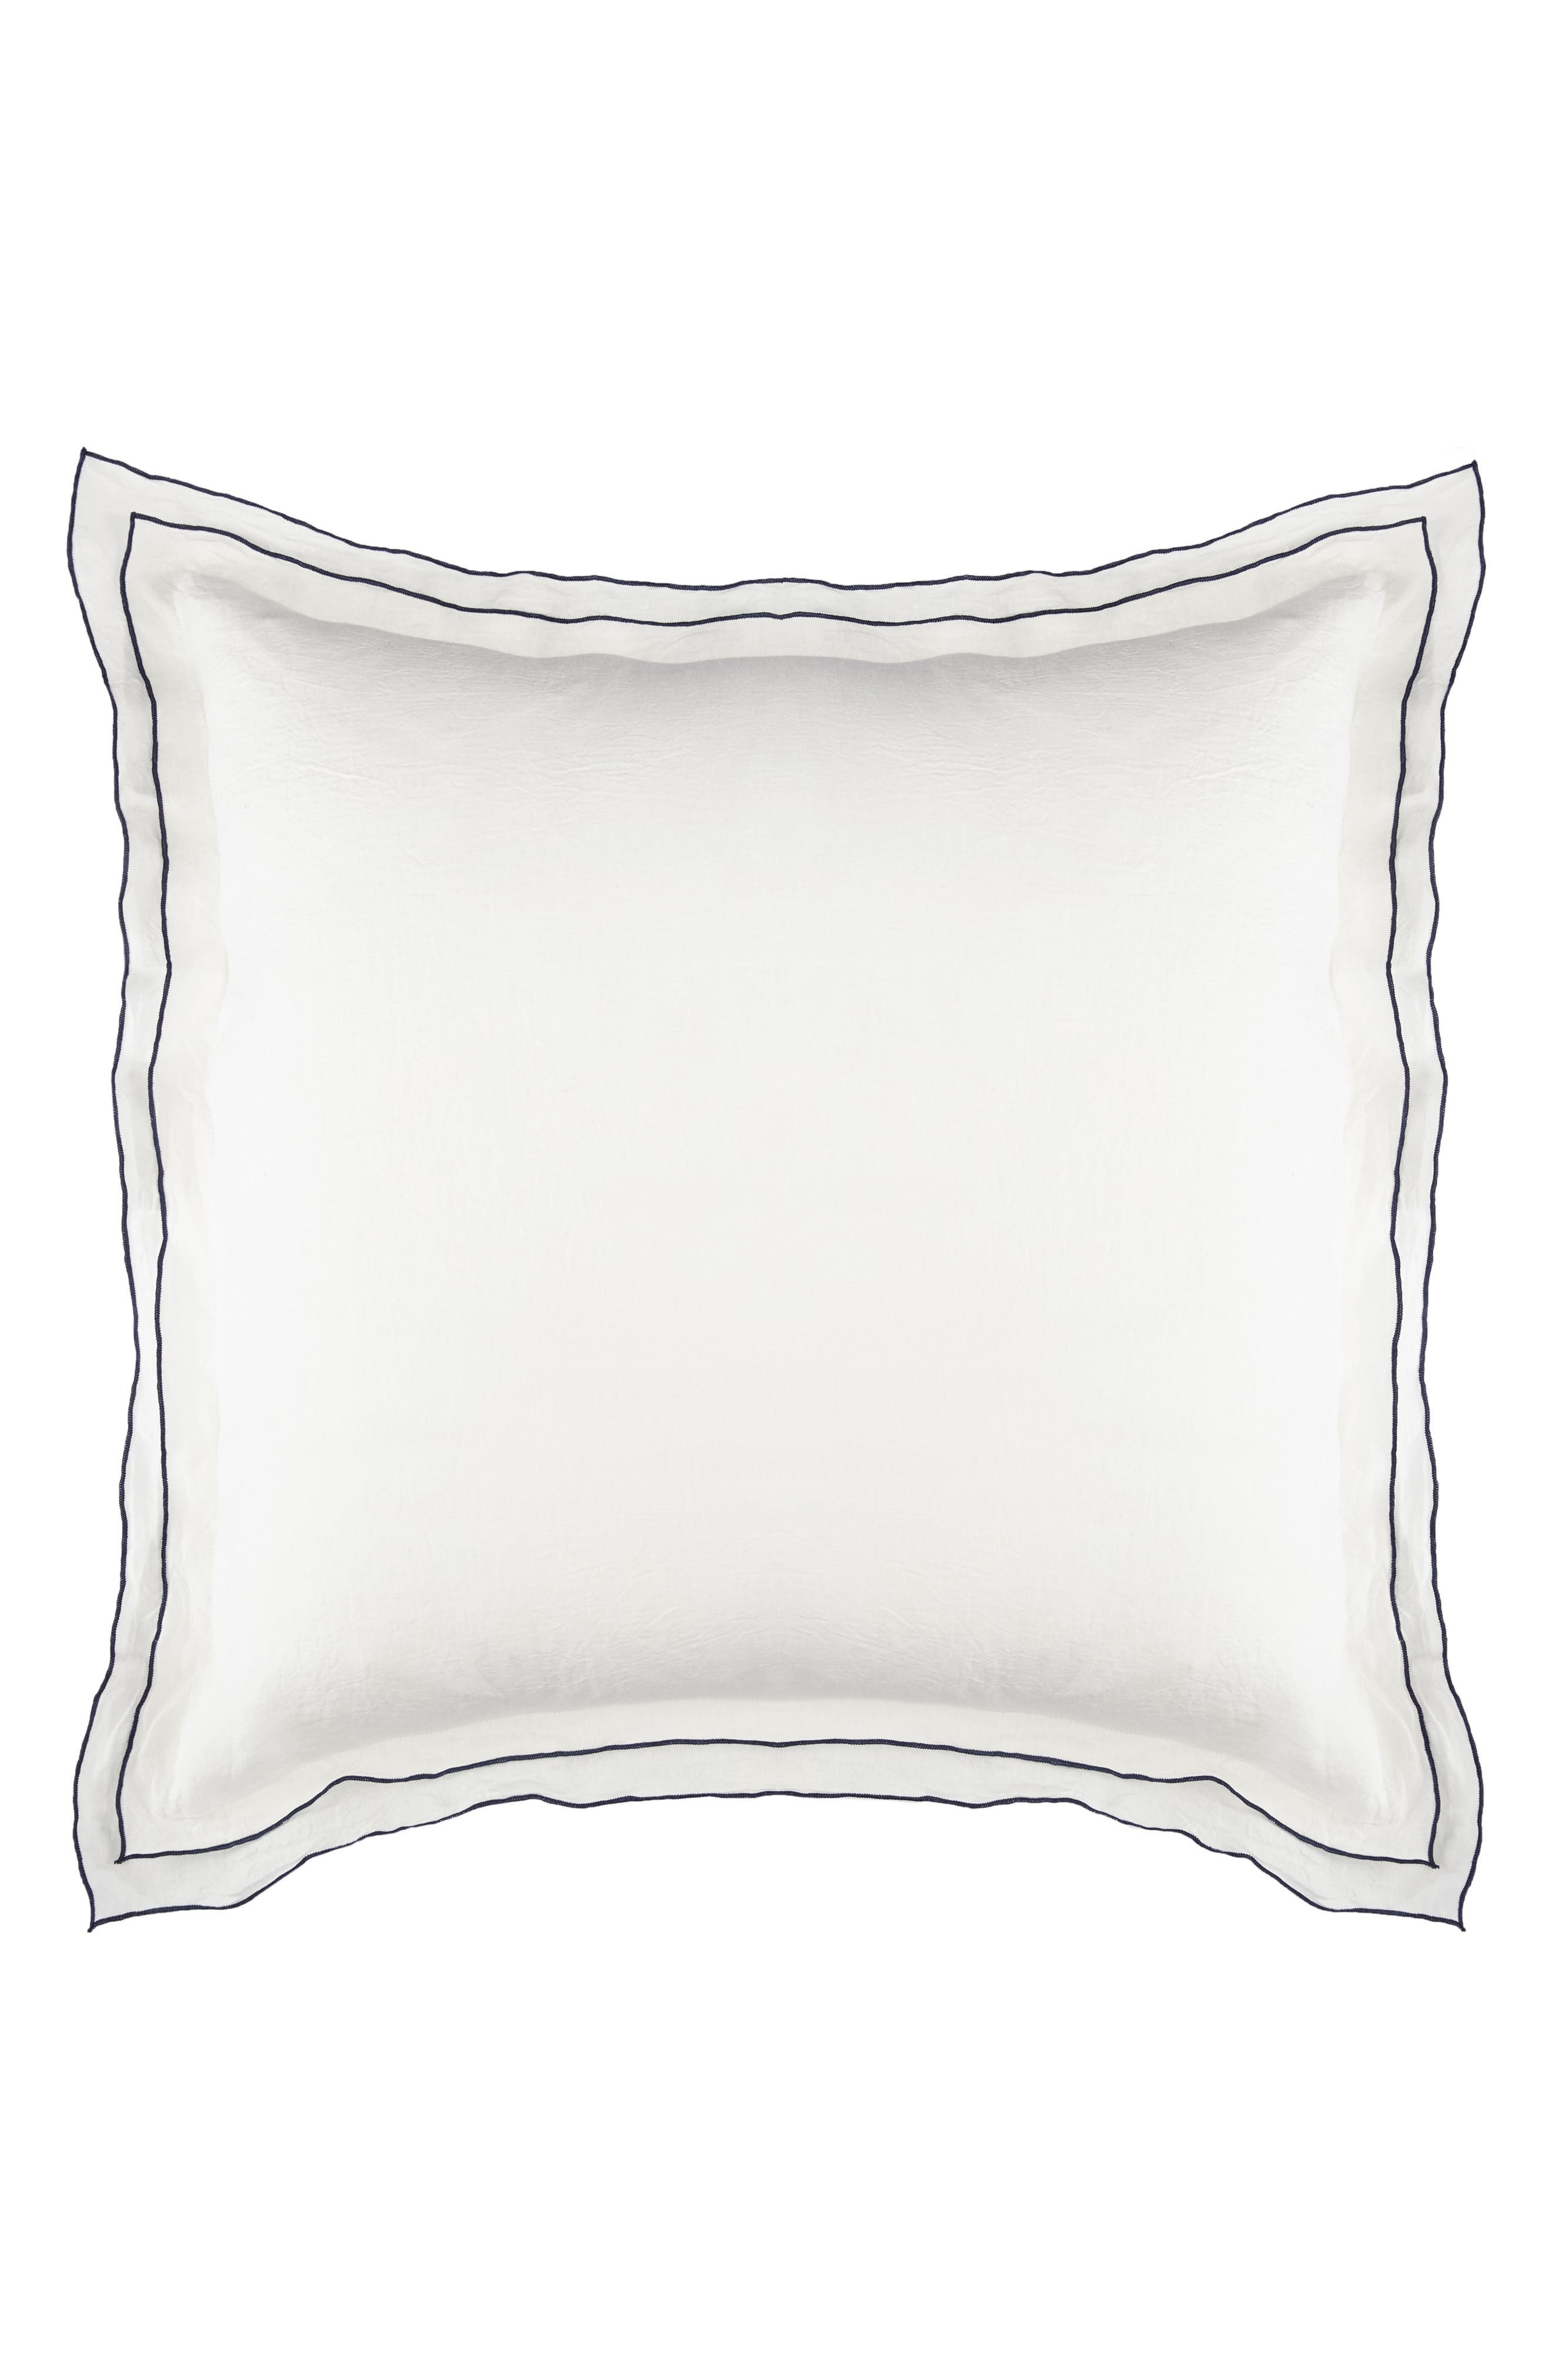 Biarritz Linen Euro Sham,                             Main thumbnail 1, color,                             White/ Indigo